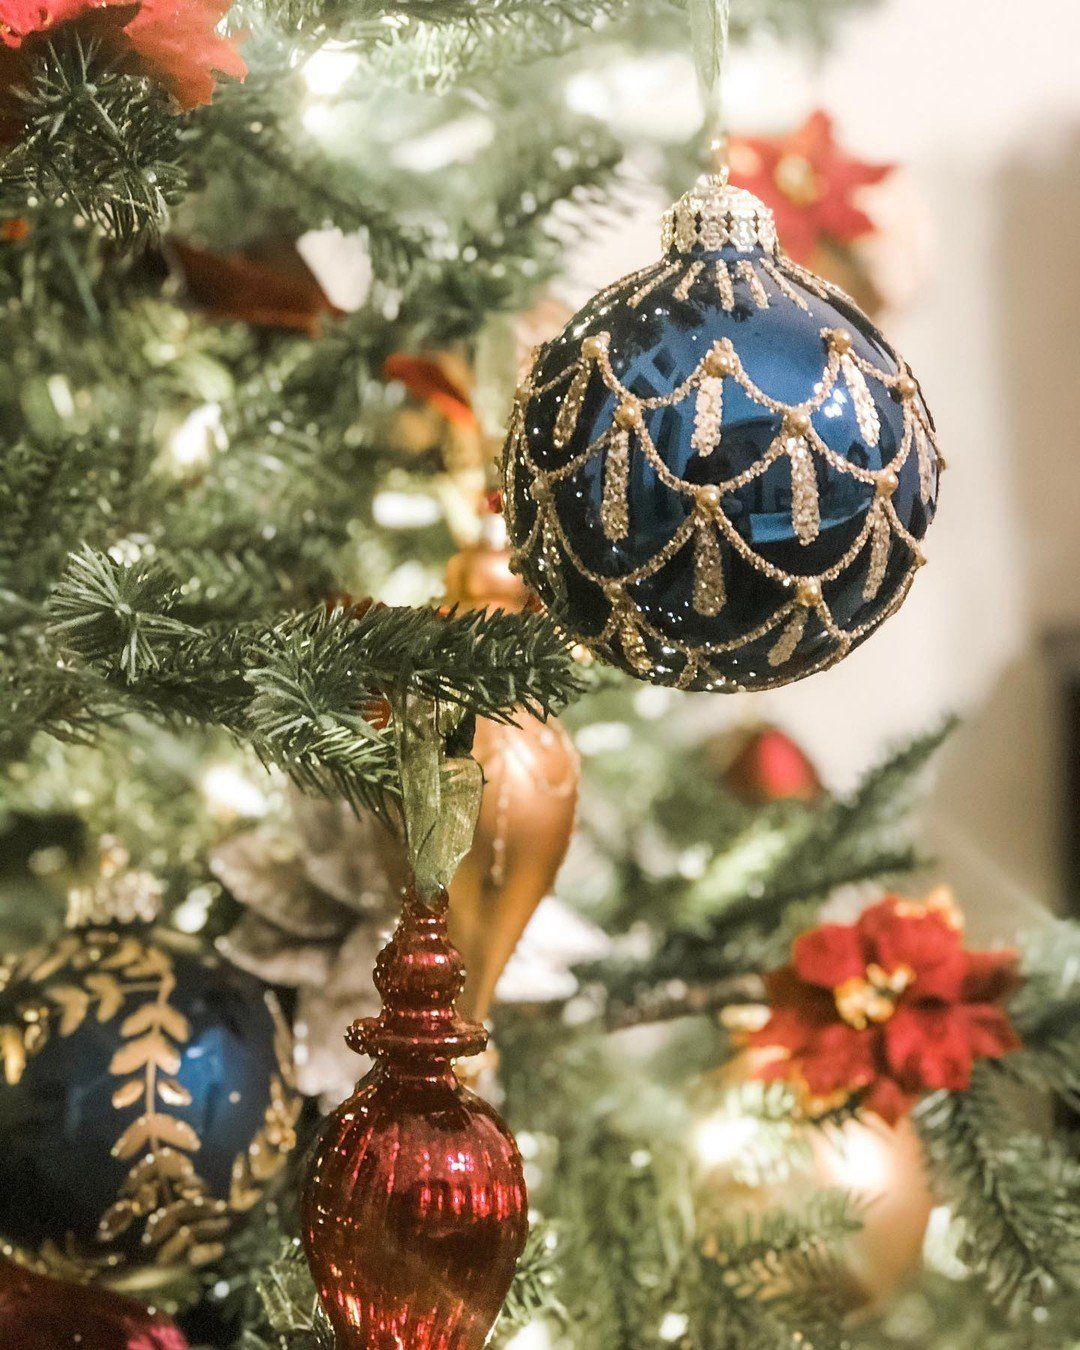 60-piece Roman Christmas Ornament Collection | Christmas ...